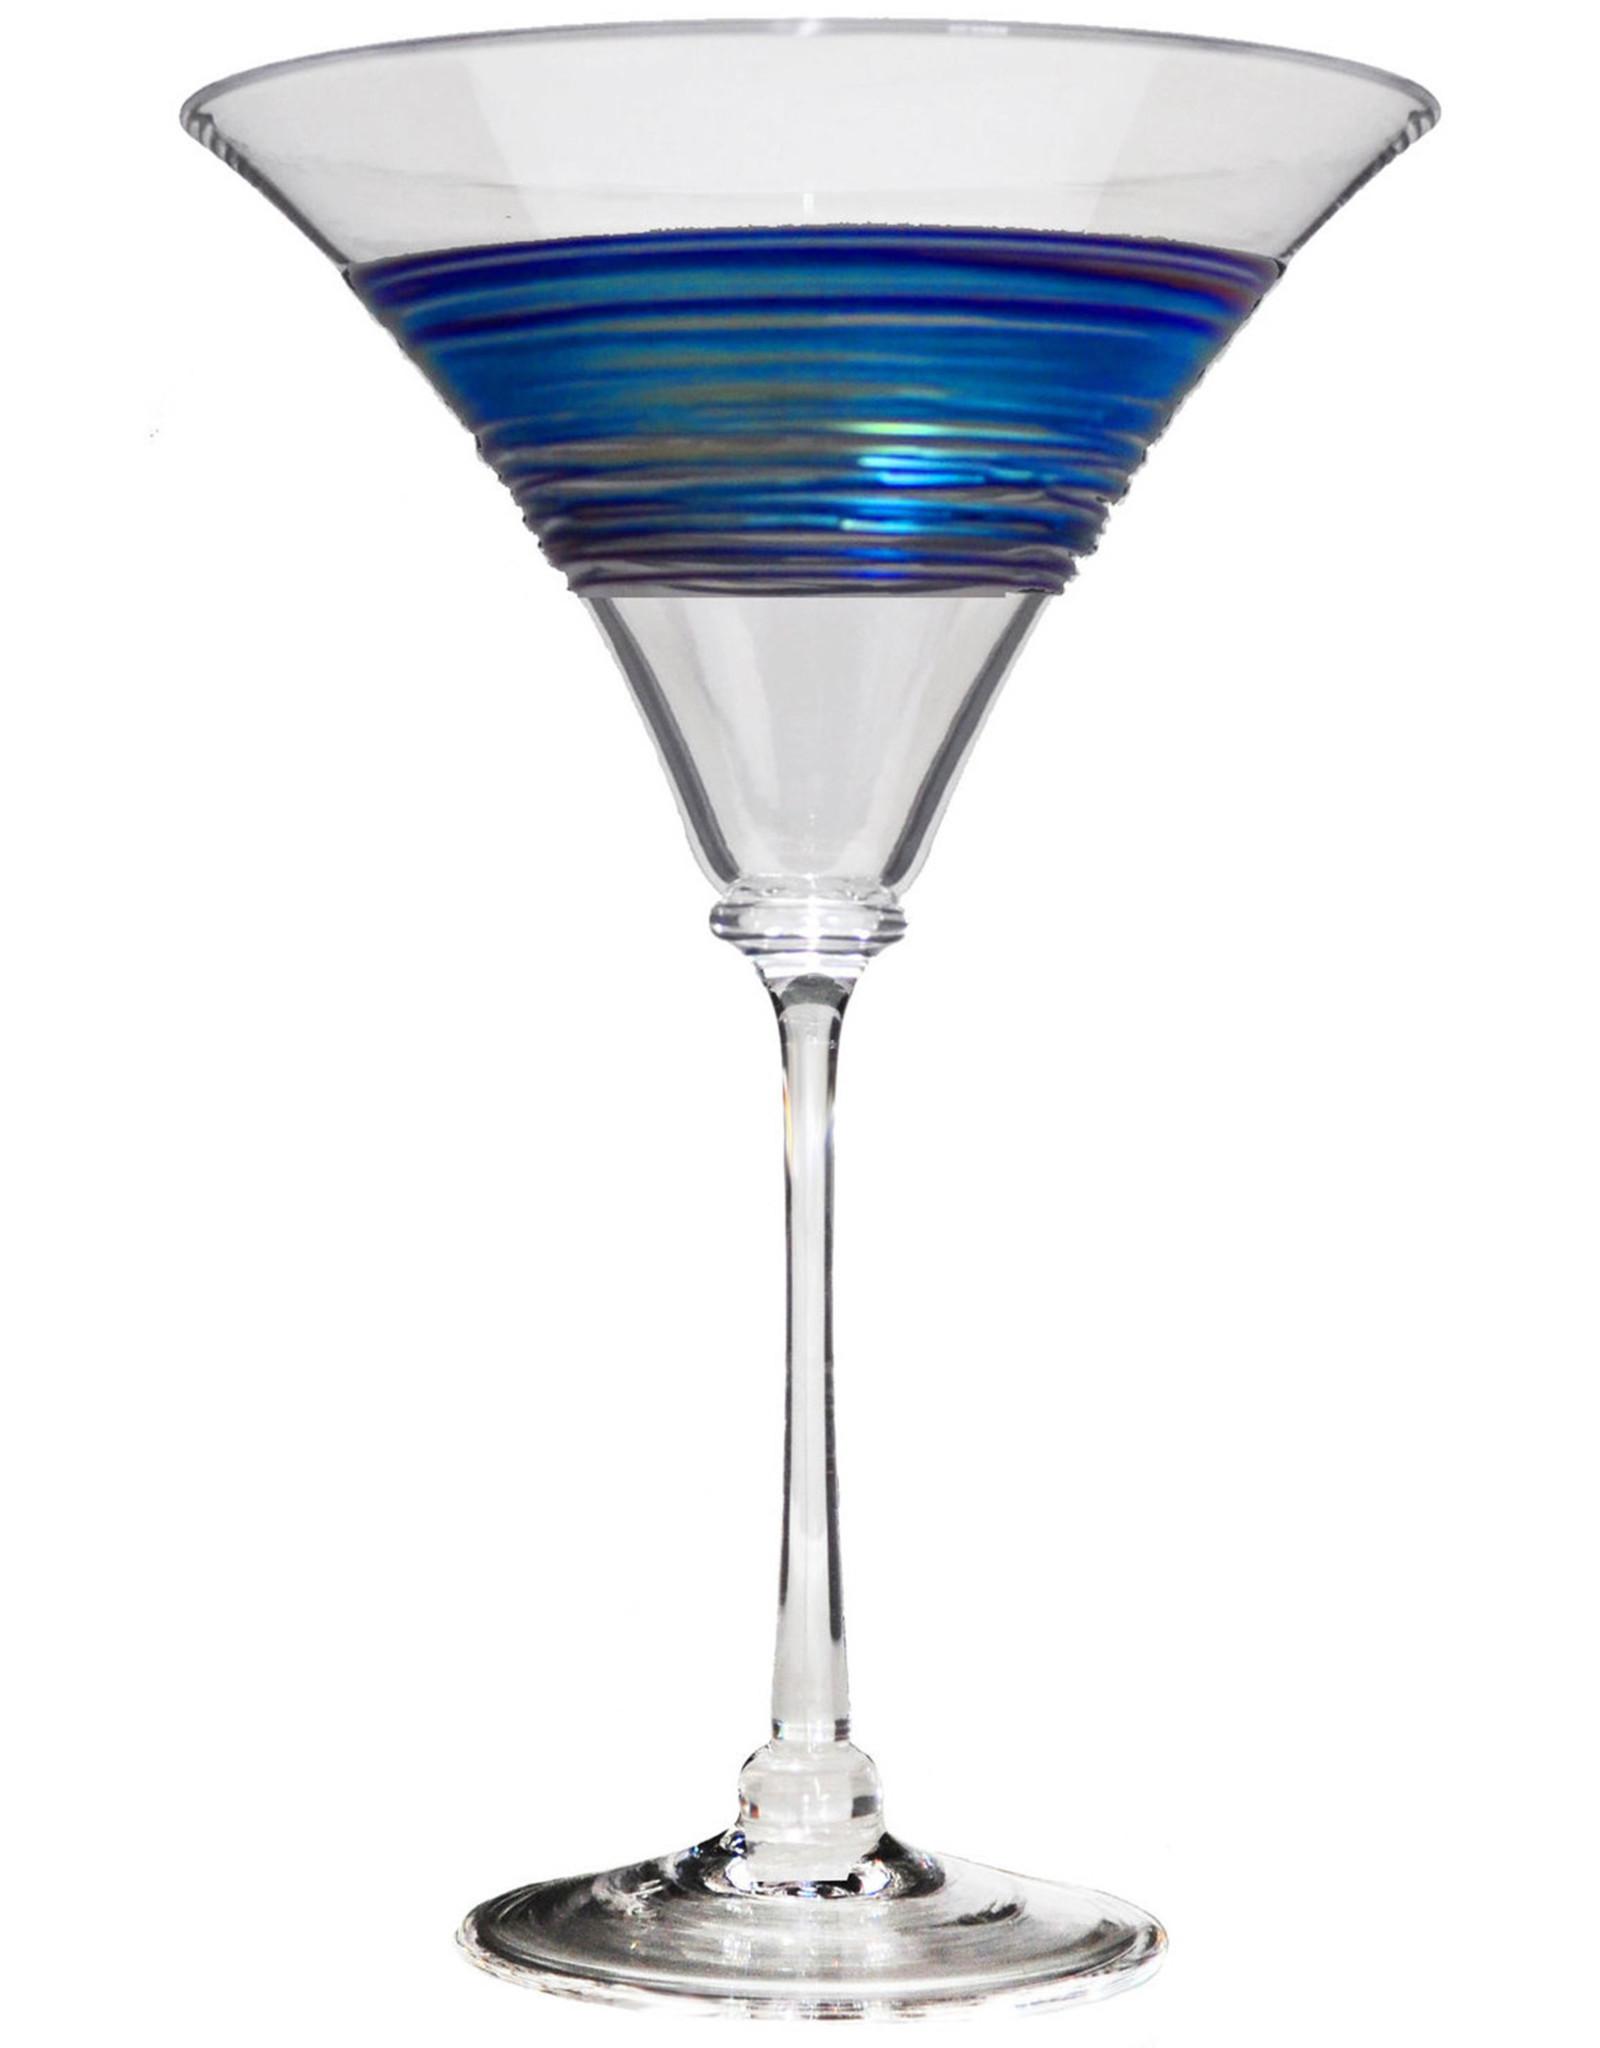 ROMEO GLASS CLEAR RAINBOW SPUN MARTINI GLASS